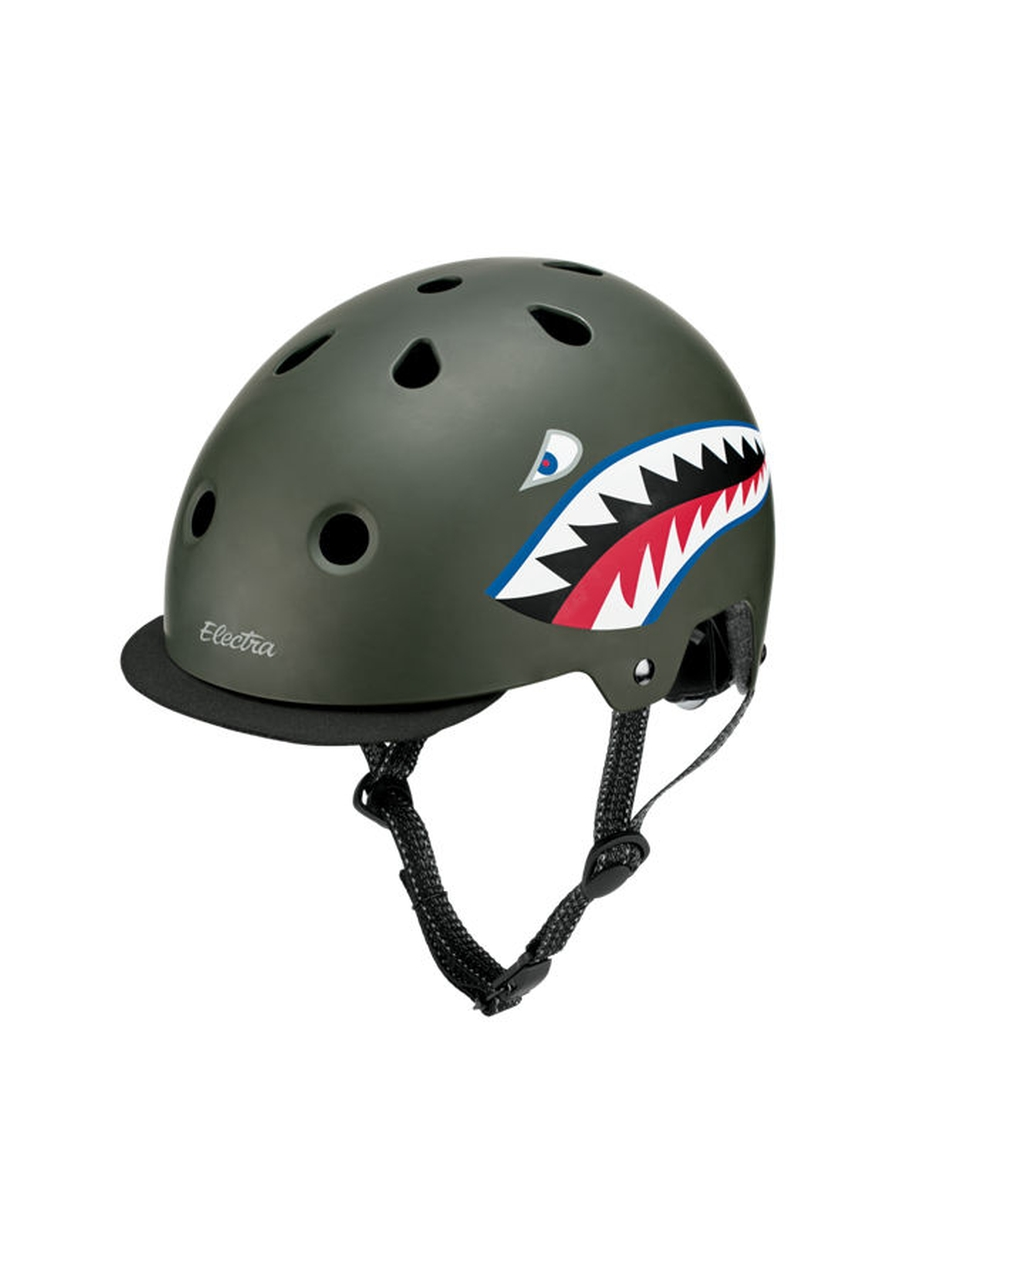 Electra - Bike Helmet - Tigershark